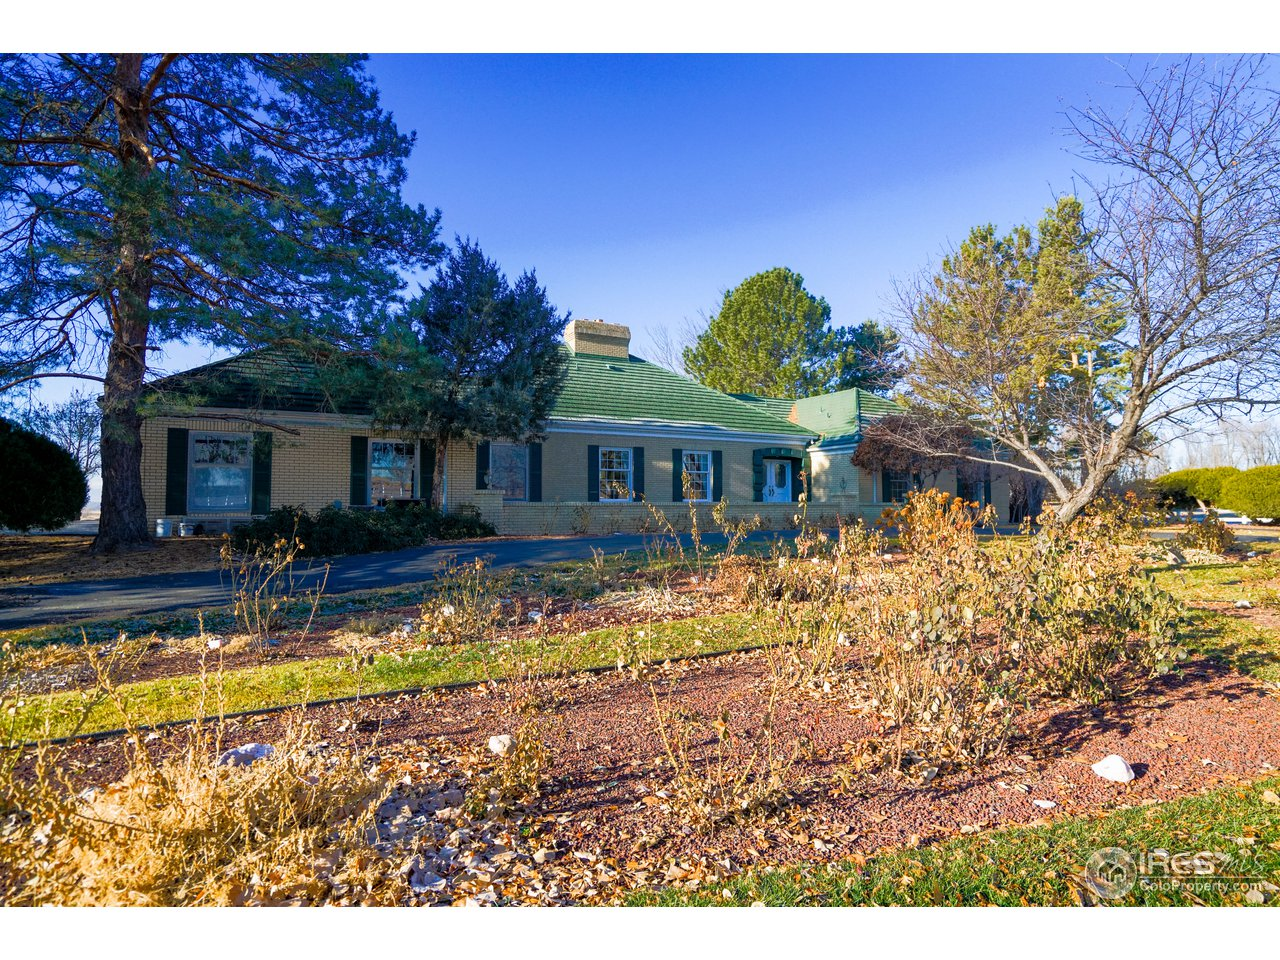 7233 County Road 72, Windsor CO 80550